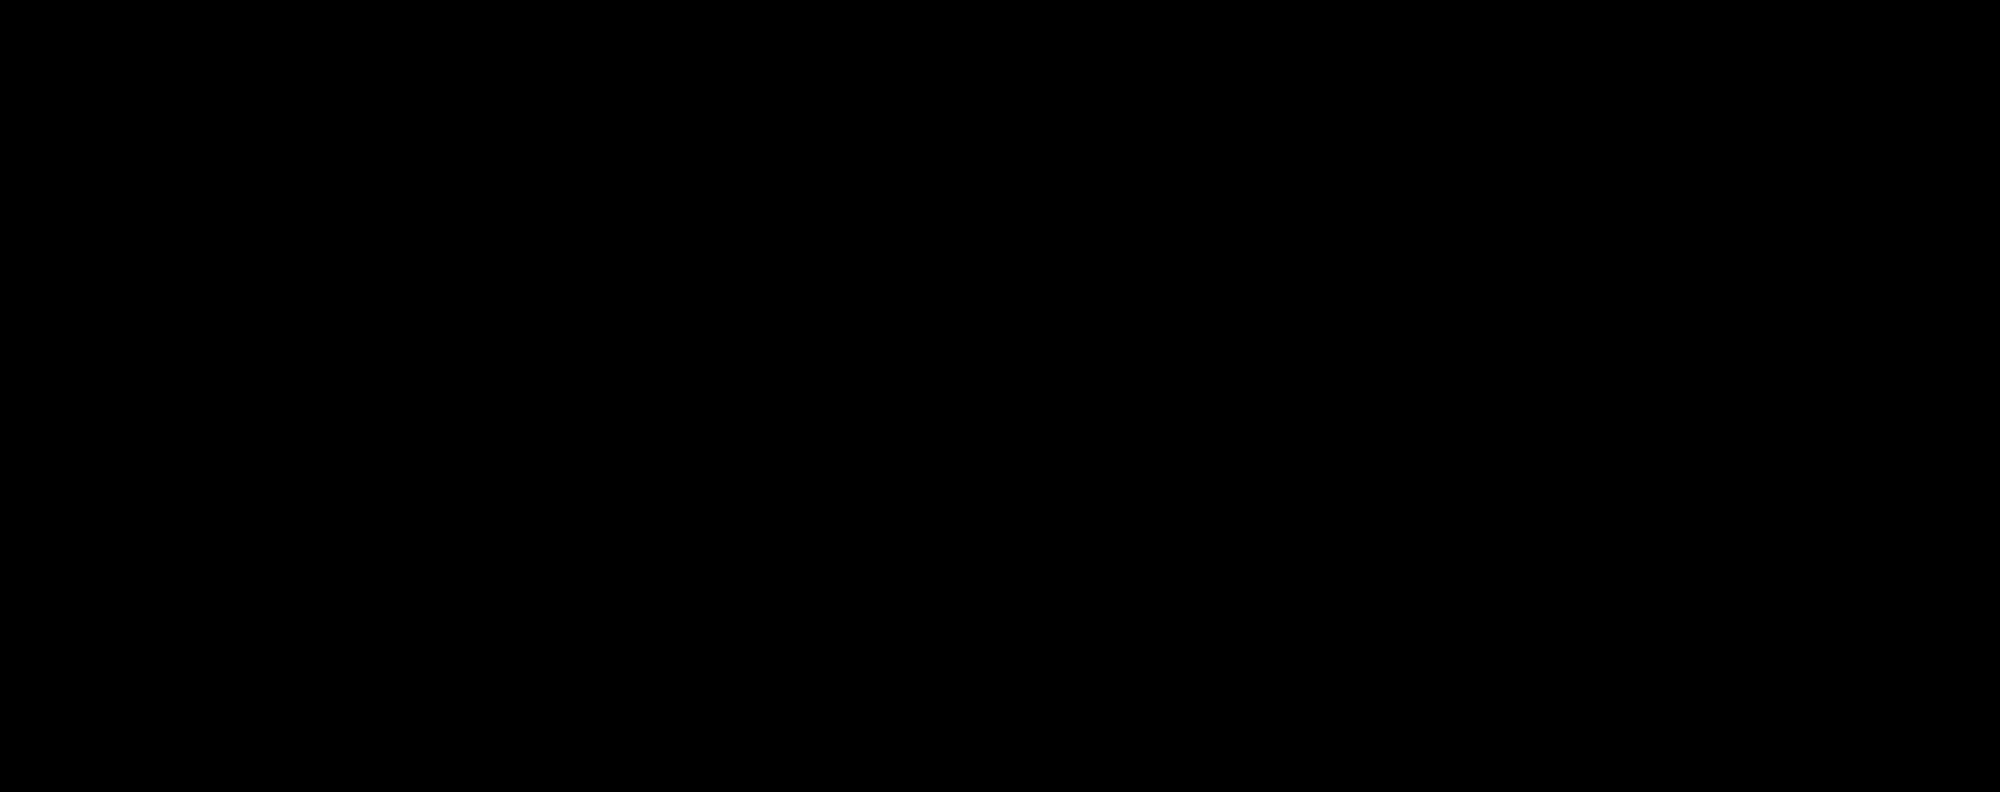 Typefont